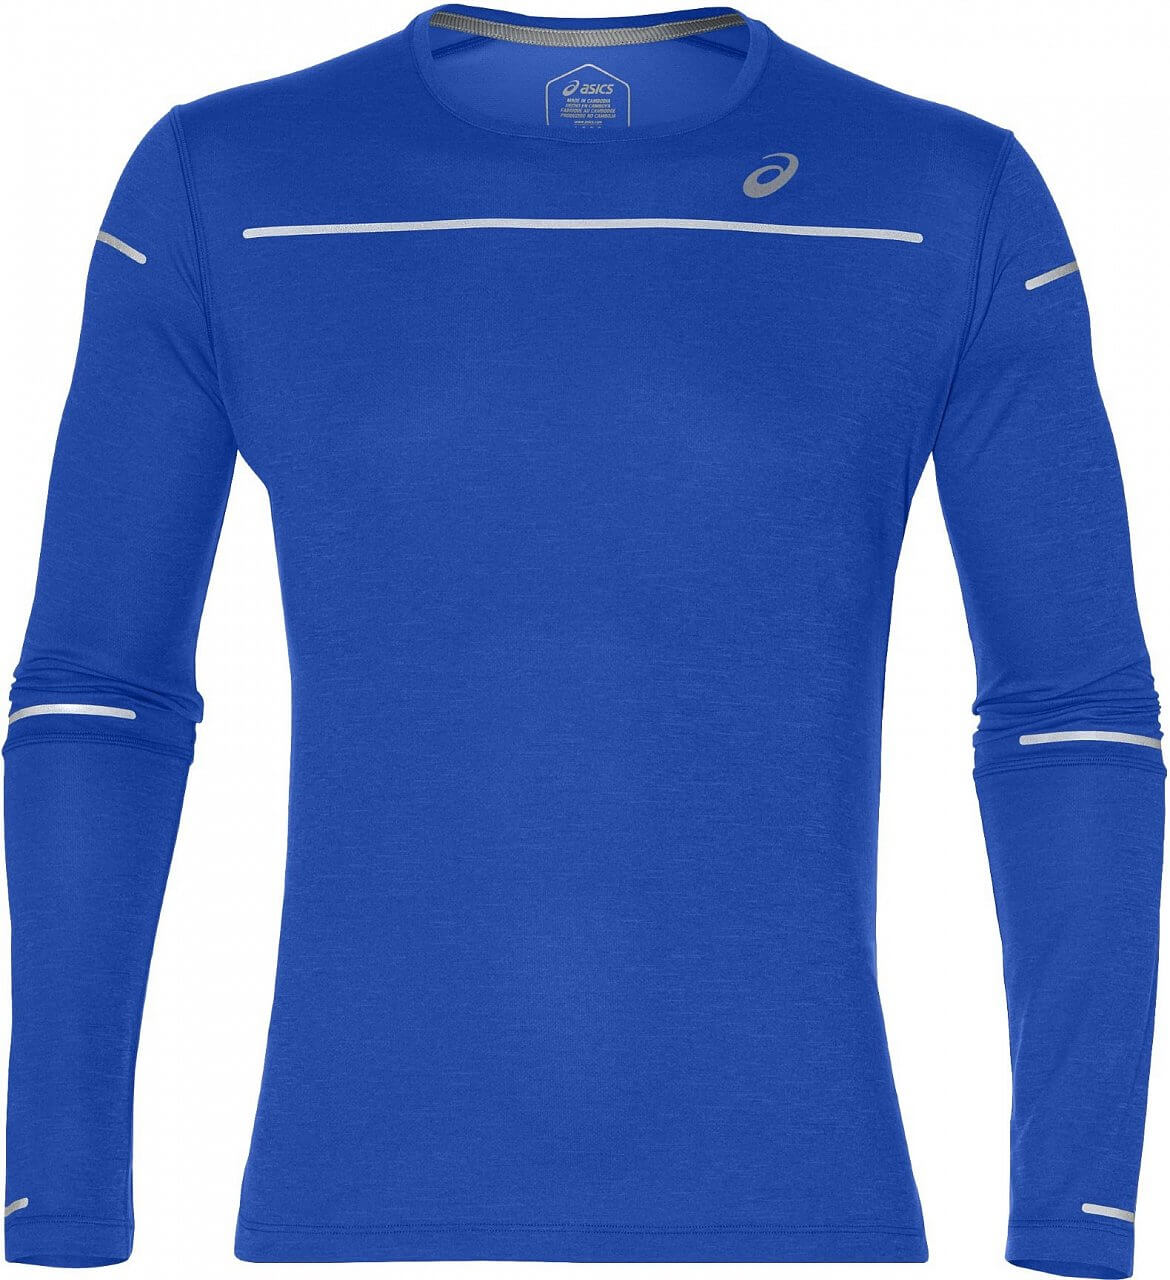 Asics Lite-Show LS Top. Pánské běžecké tričko e1bdfcf166